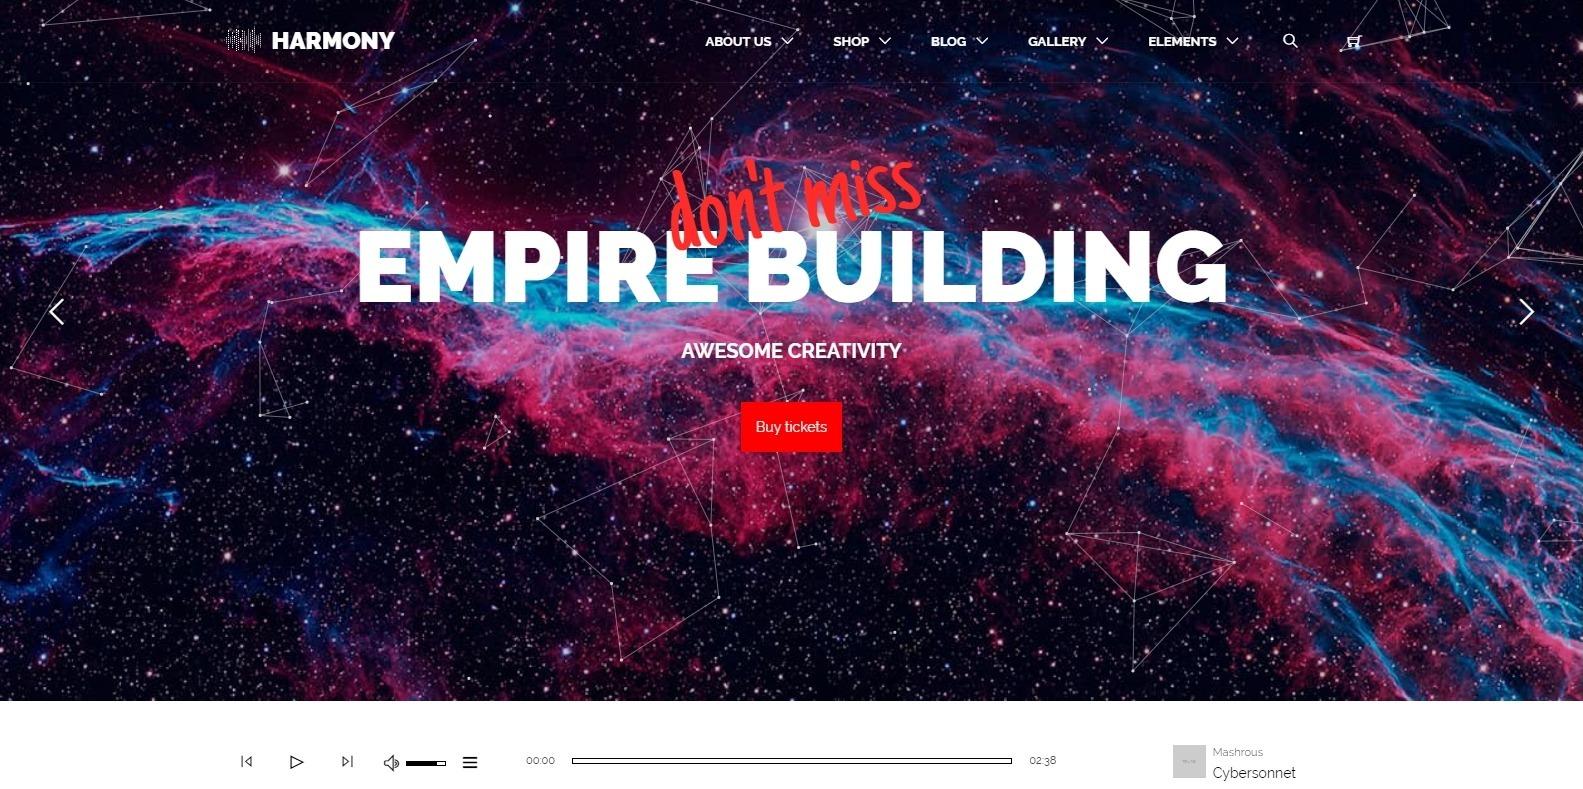 harmony-dj-website-template